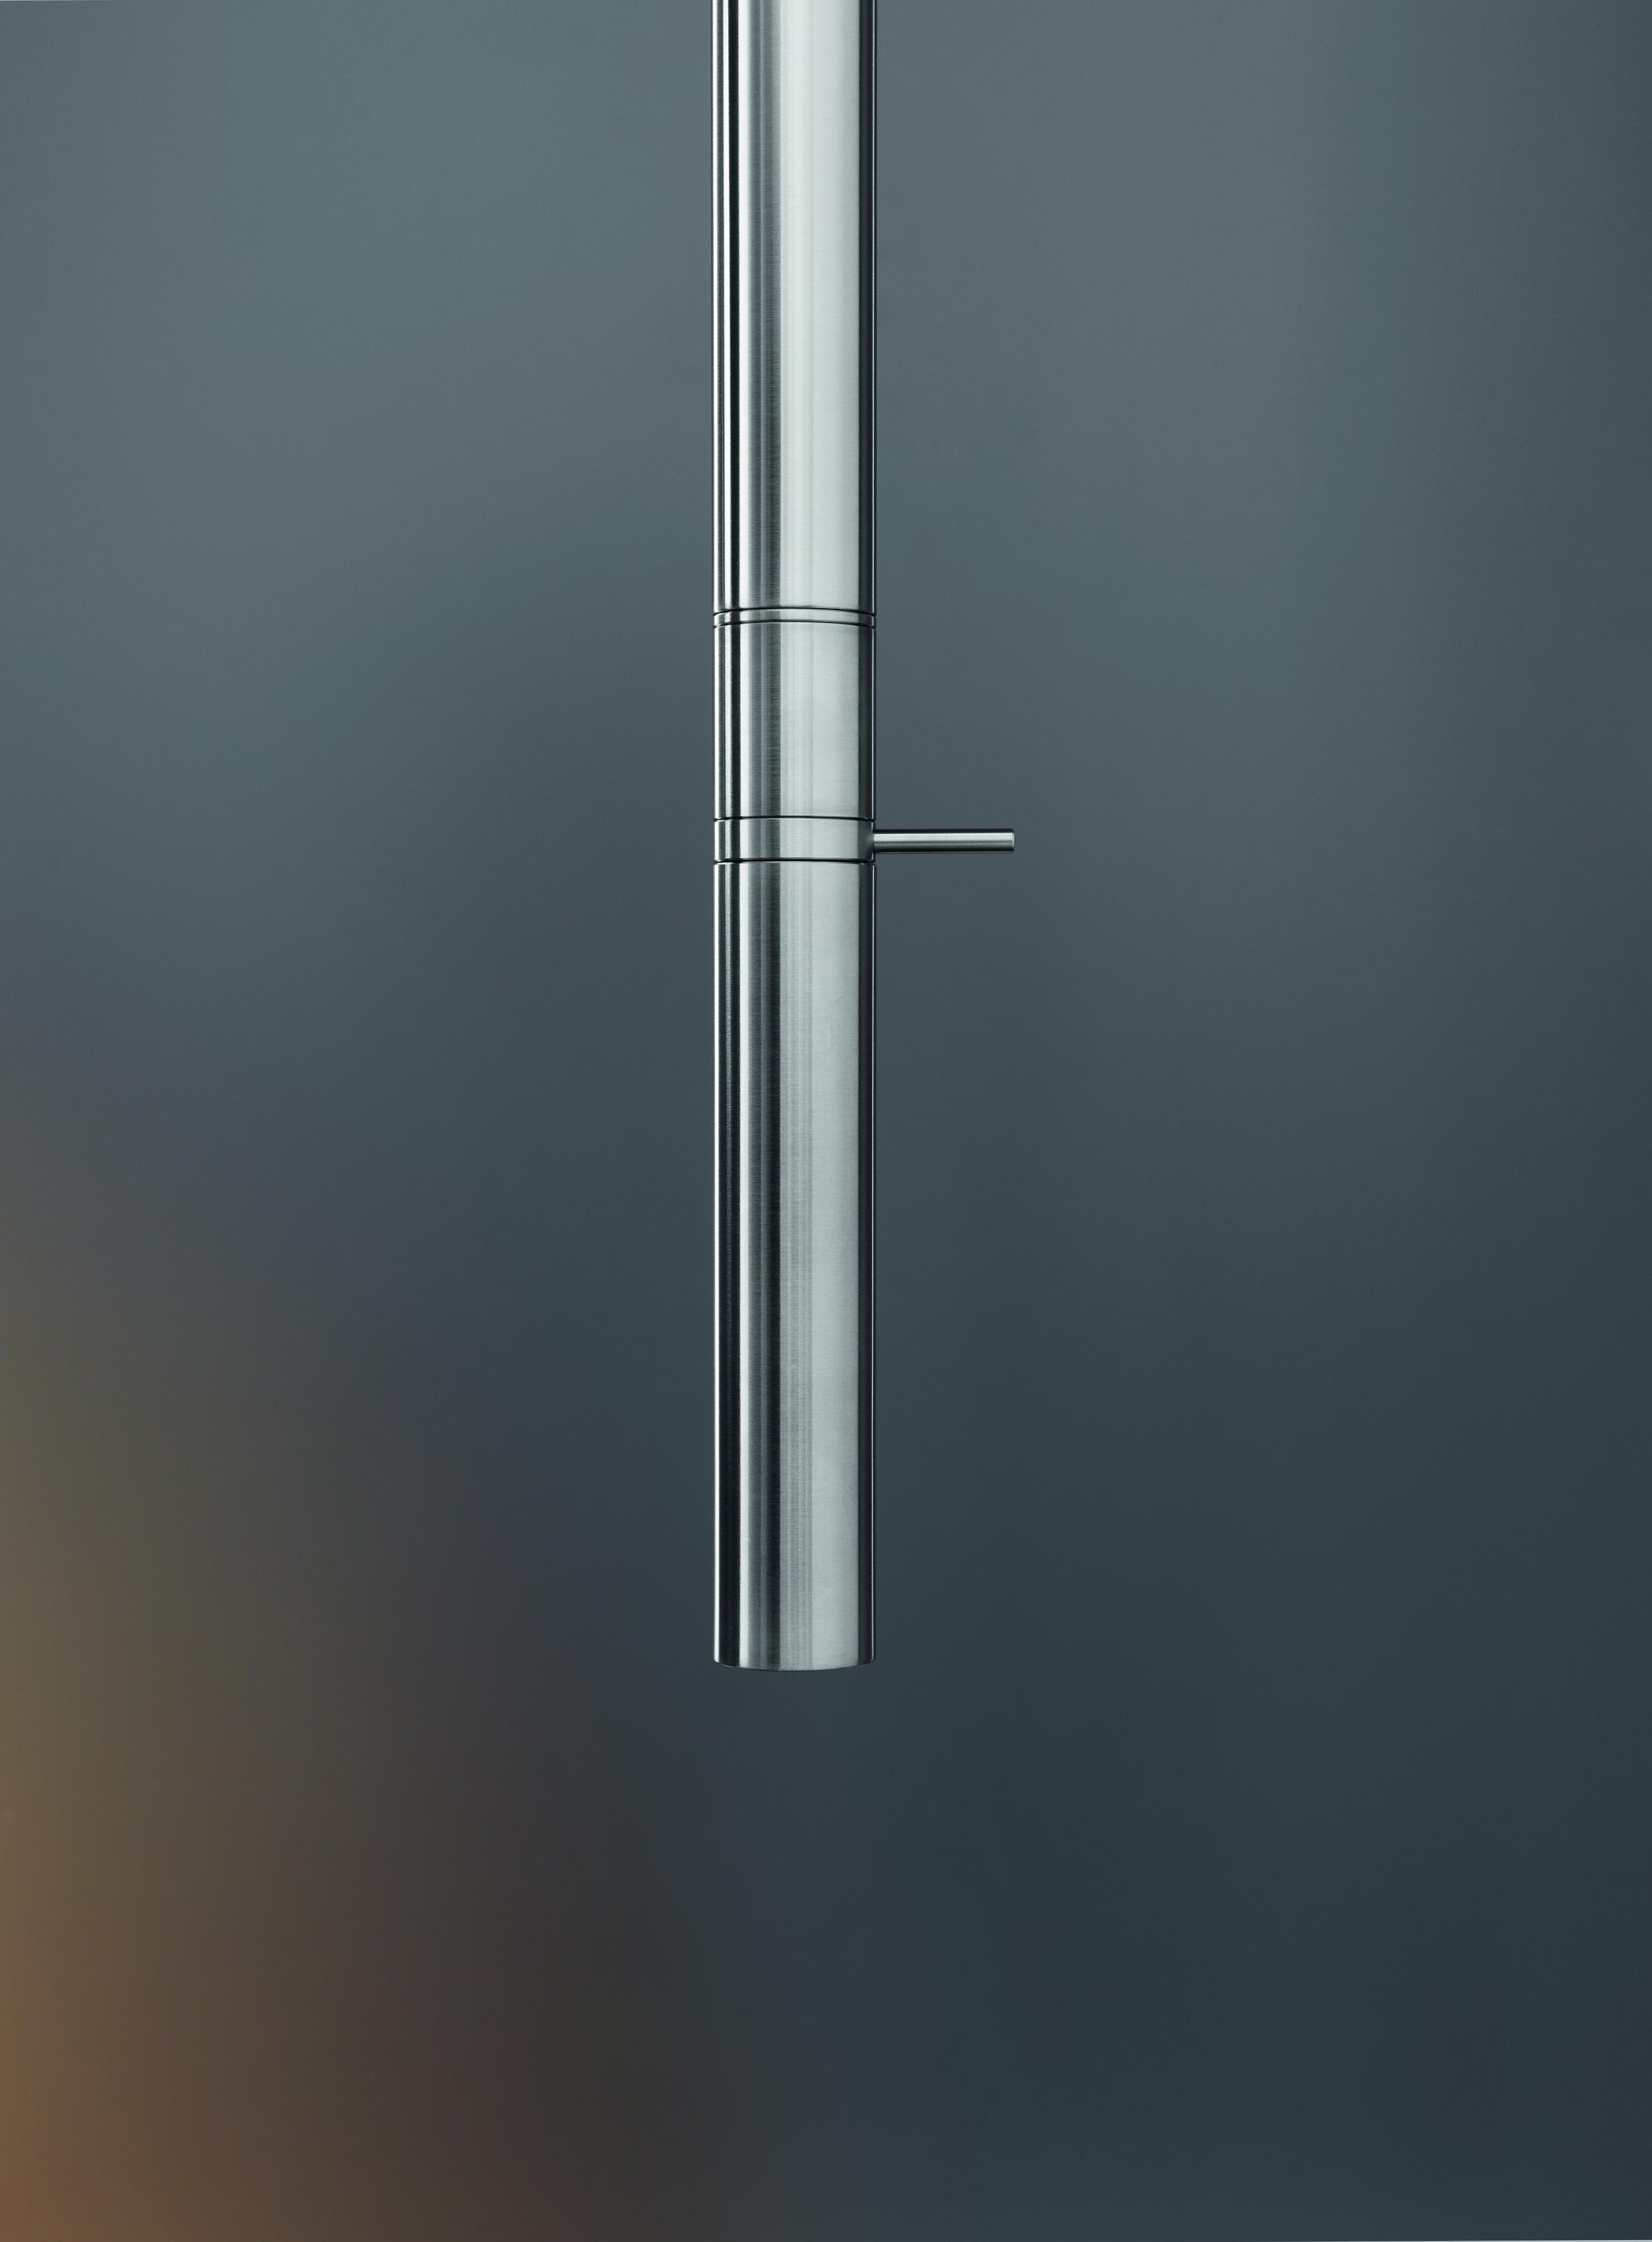 Contemporary Gradi Ceiling Mount Faucet